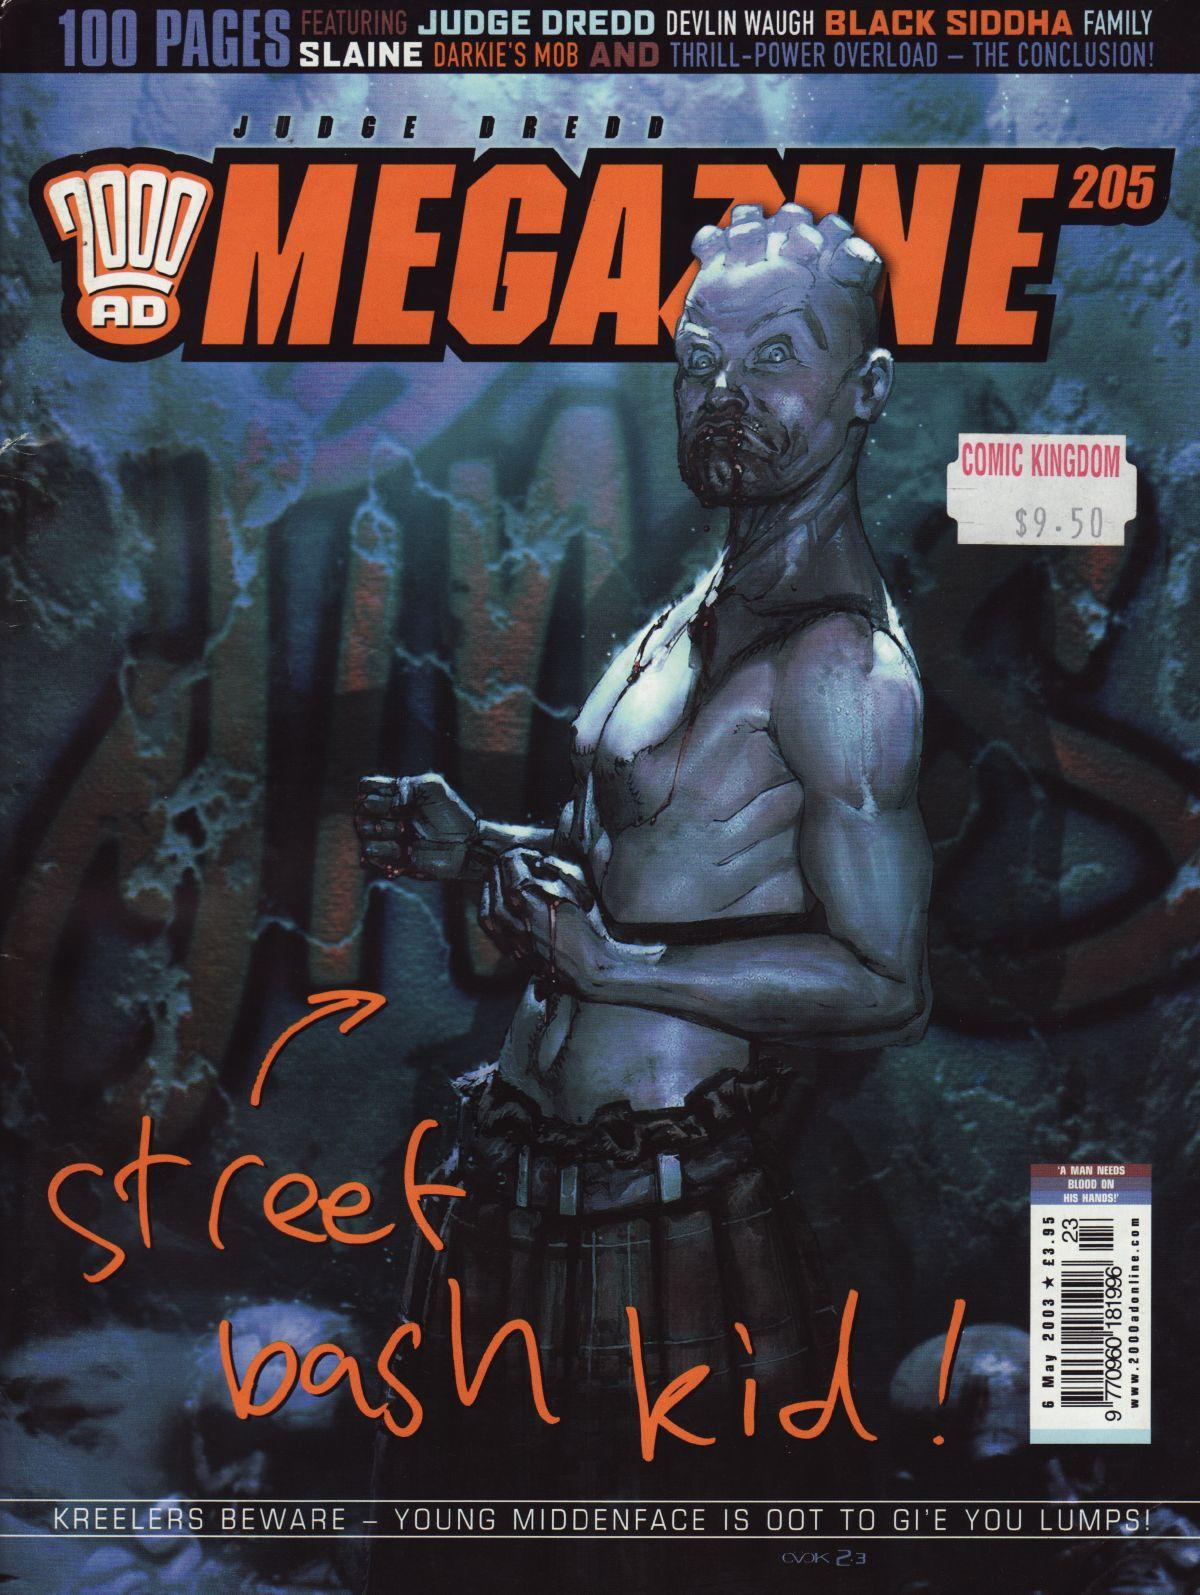 Judge Dredd Megazine (Vol. 5) issue 205 - Page 1